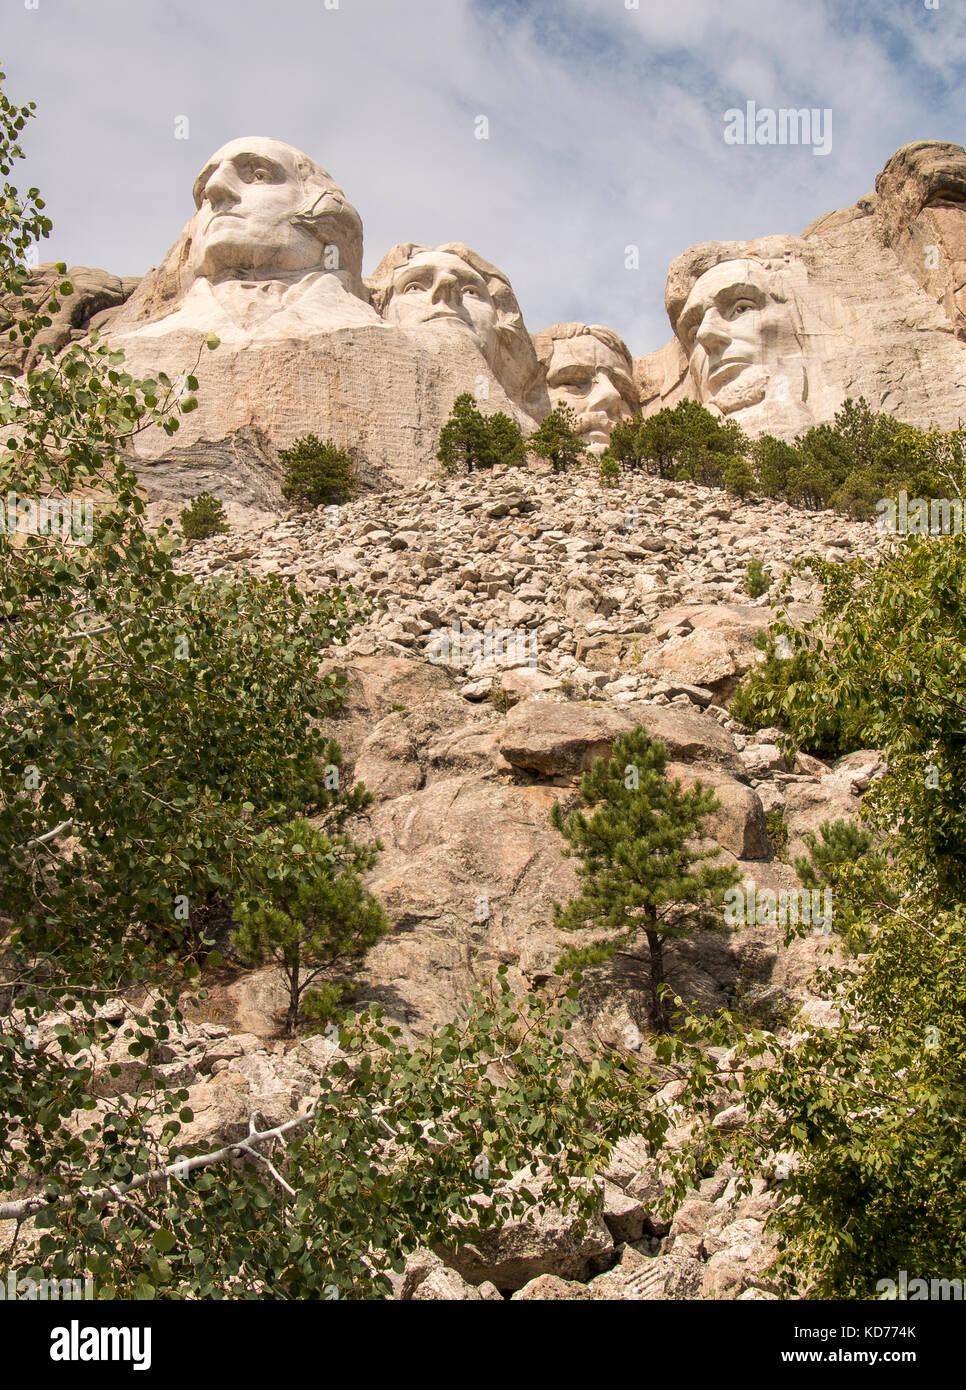 BLACK HILLS, SOUTH DAKOTA/USA - August 25, 2014: A view upward at Mount Rushmore National Monument. - Stock Image